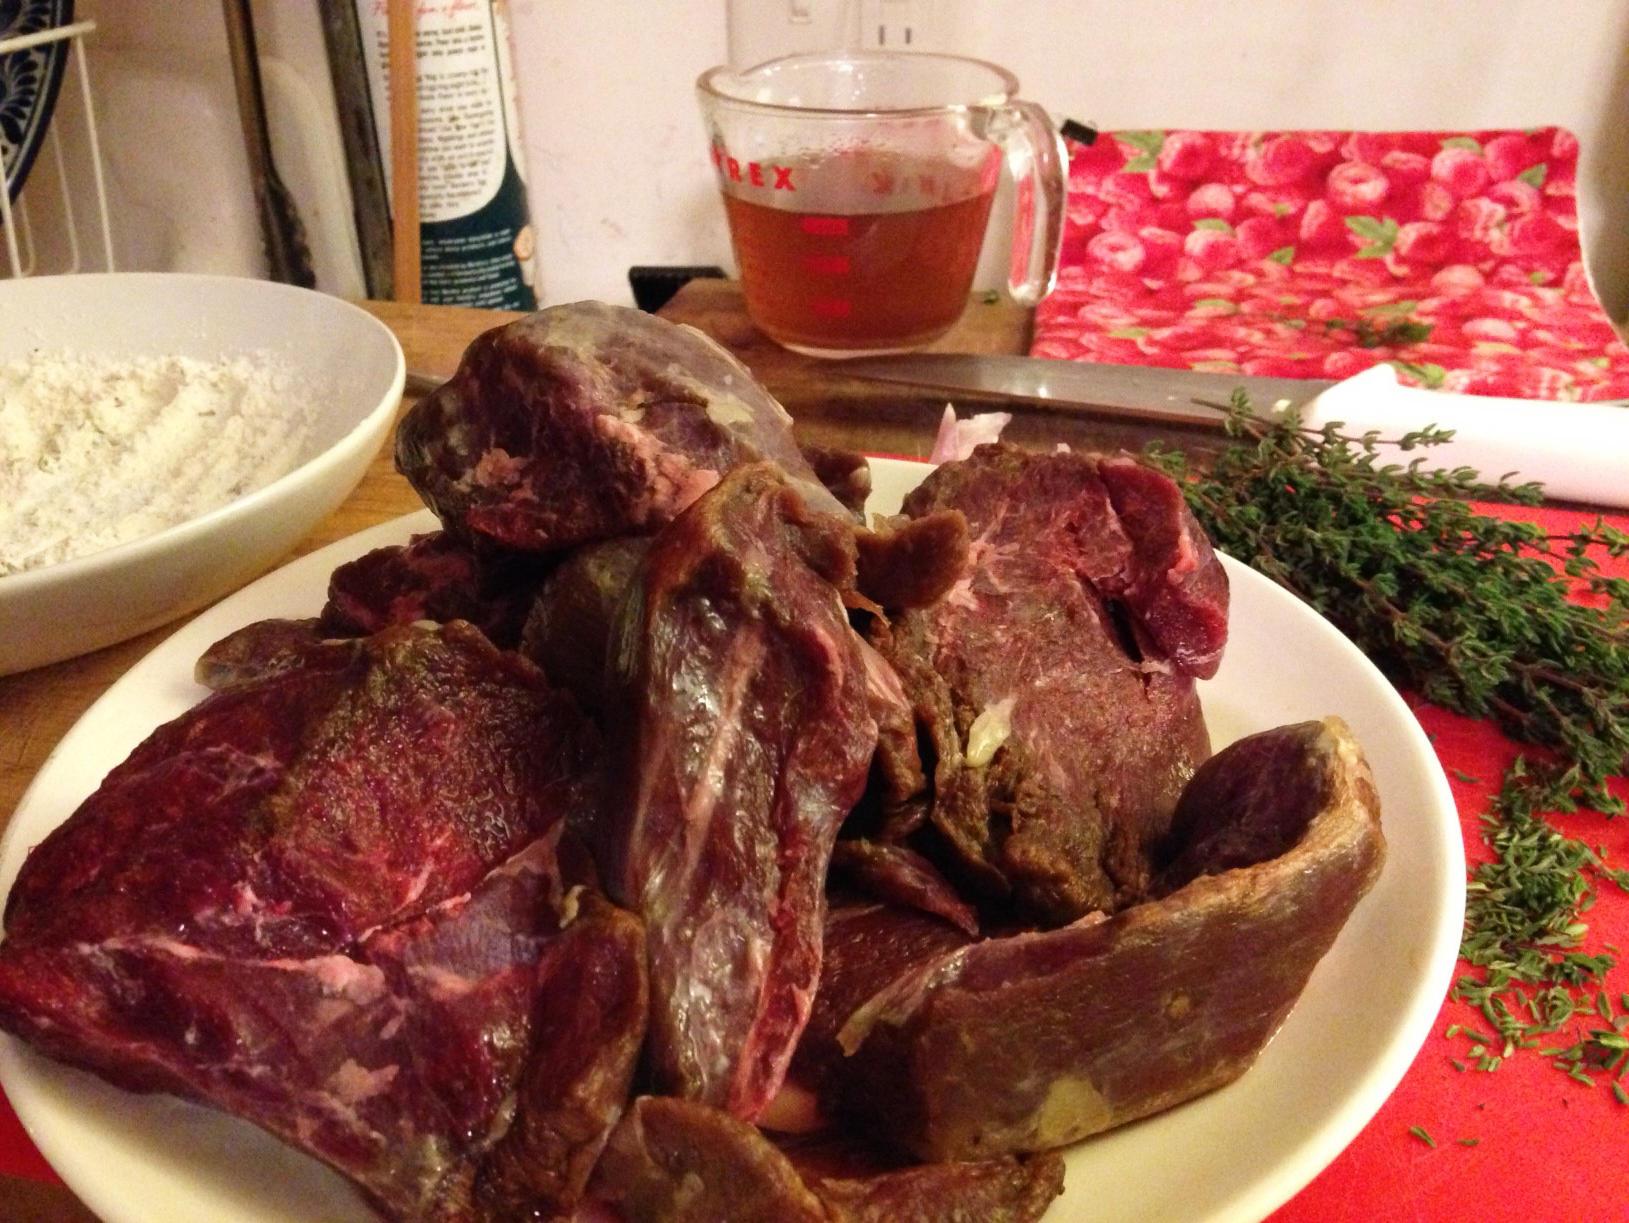 Bear meat - photo#10